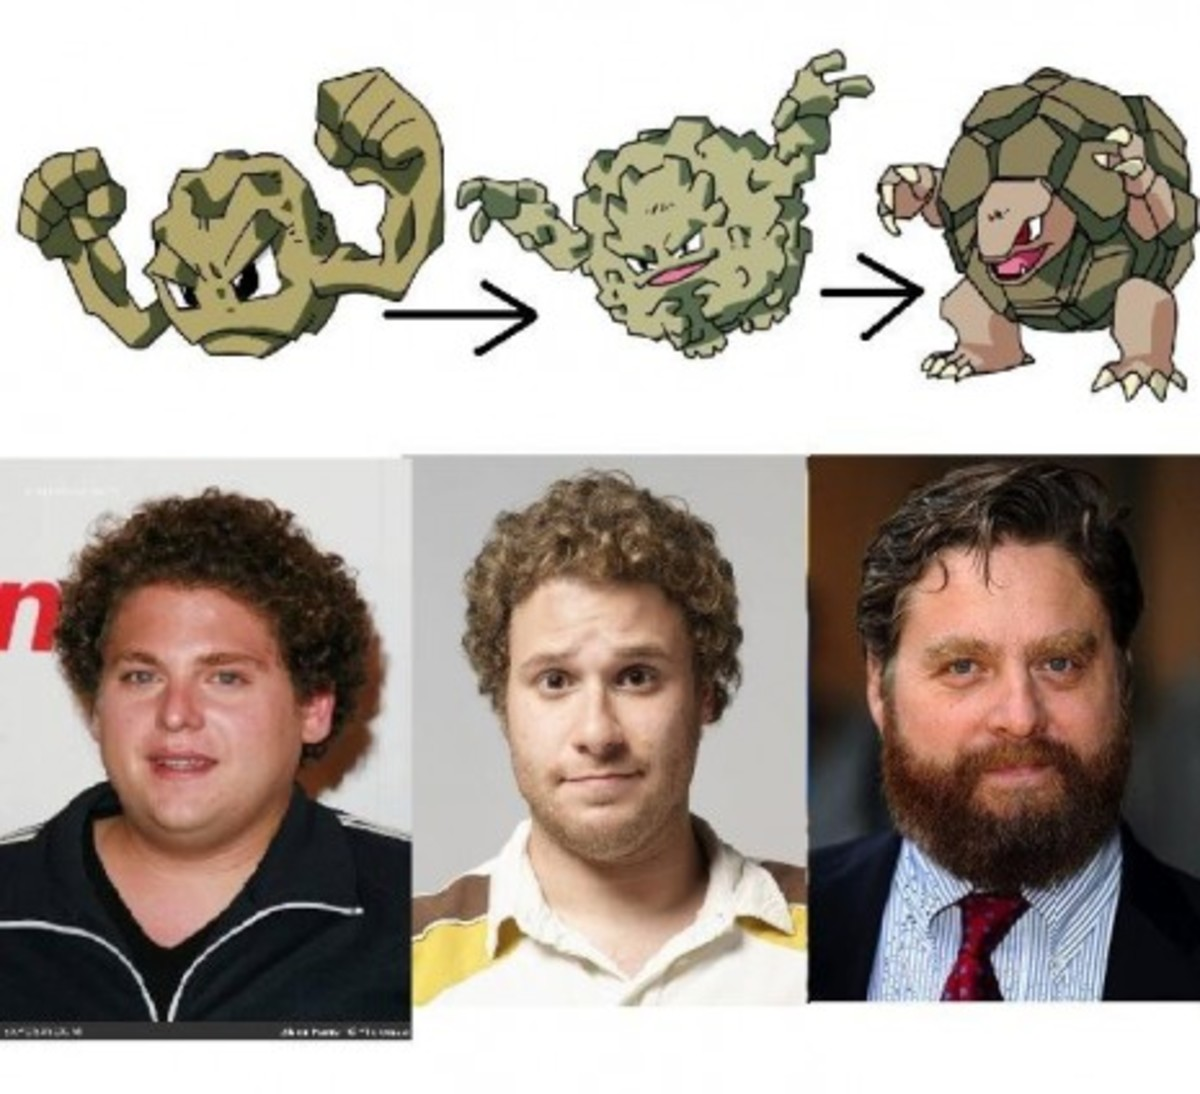 The original celebrity Pokémon Evolution Meme